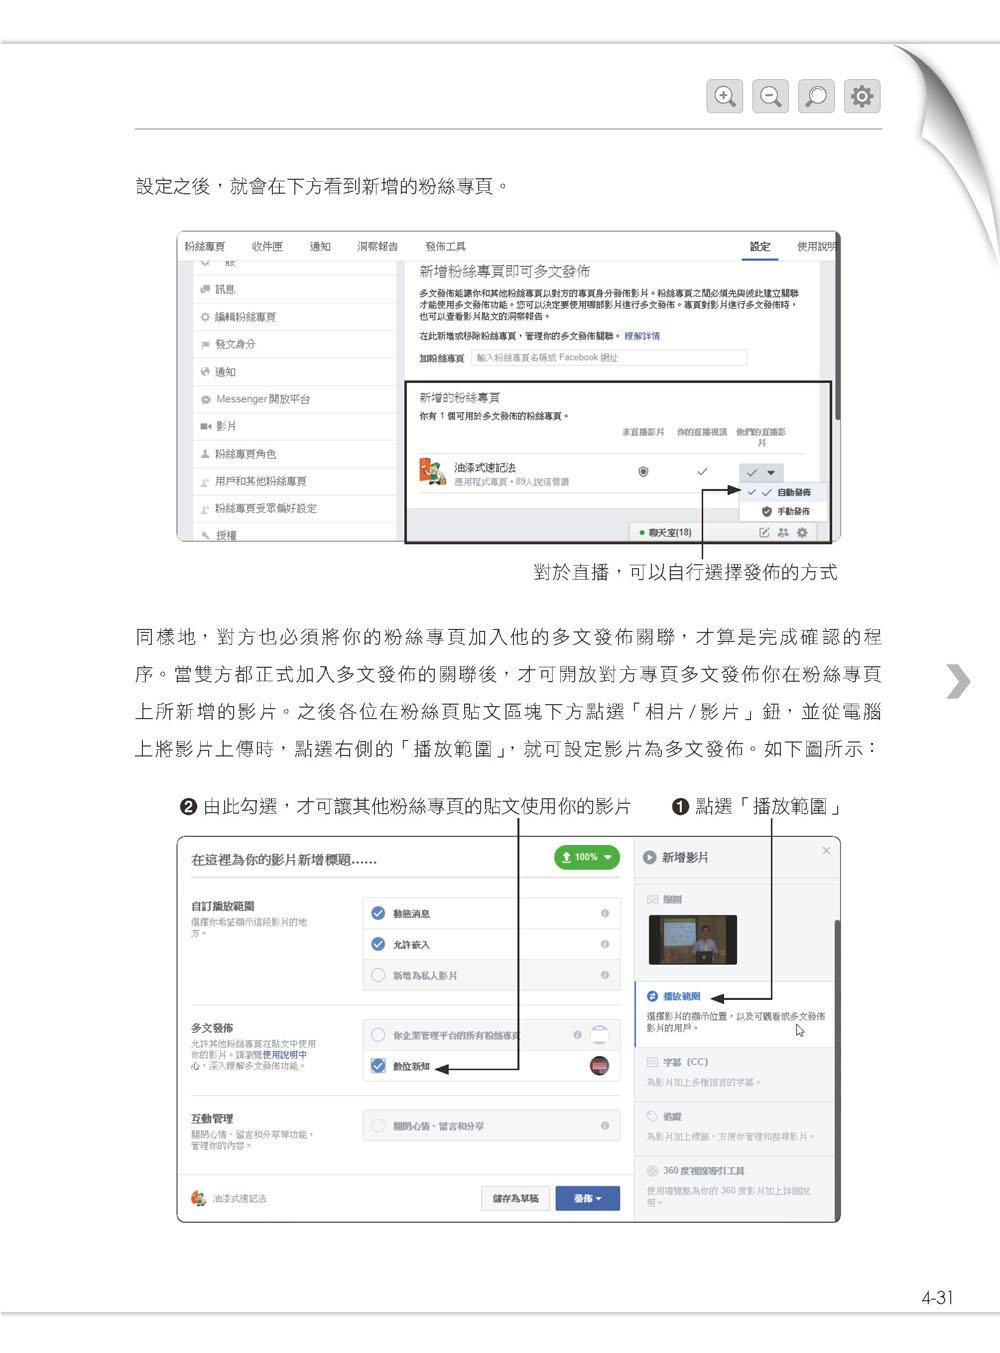 Facebook 互動行銷:社群口碑經營新思路+廣告投放如何有成效,想做好臉書行銷,操作心法就在這!-preview-38